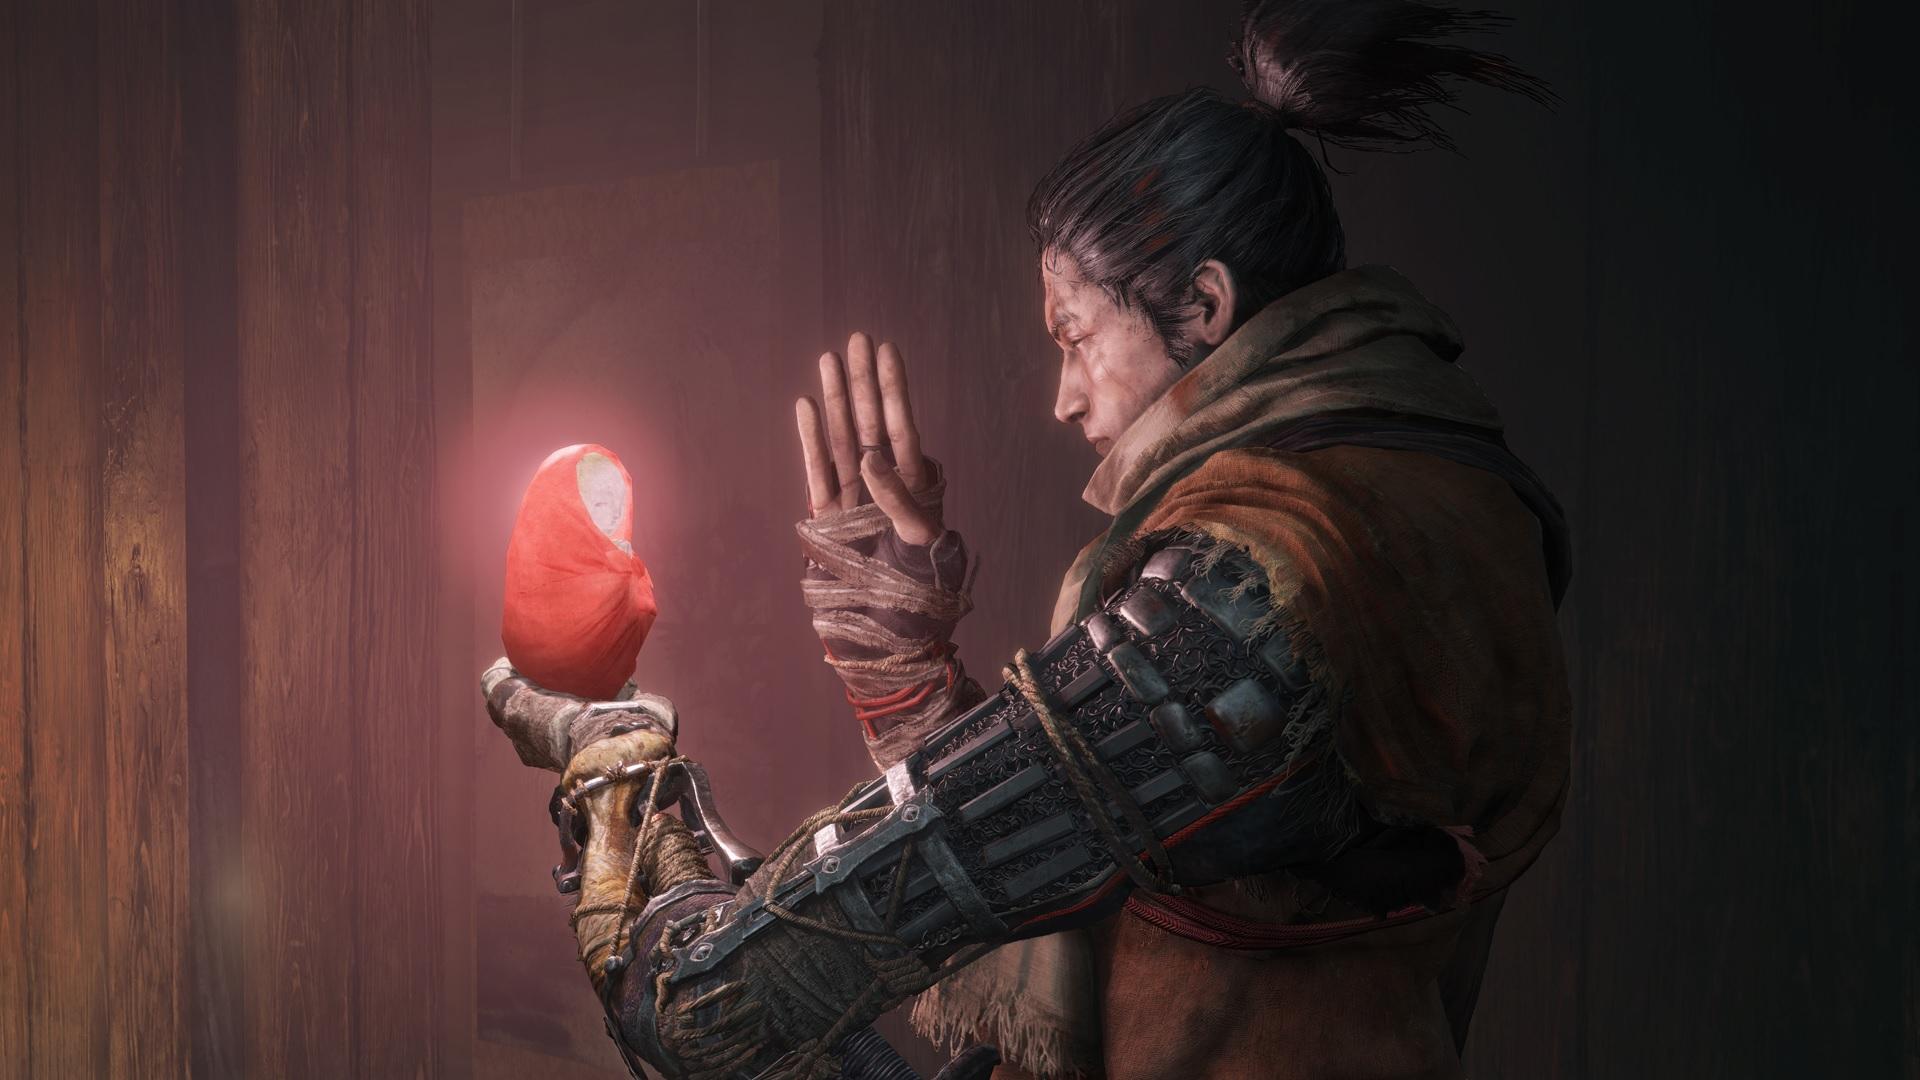 Sekiro: Shadows Die Twice | The 10 Best Video Games of 2019 | Gammicks